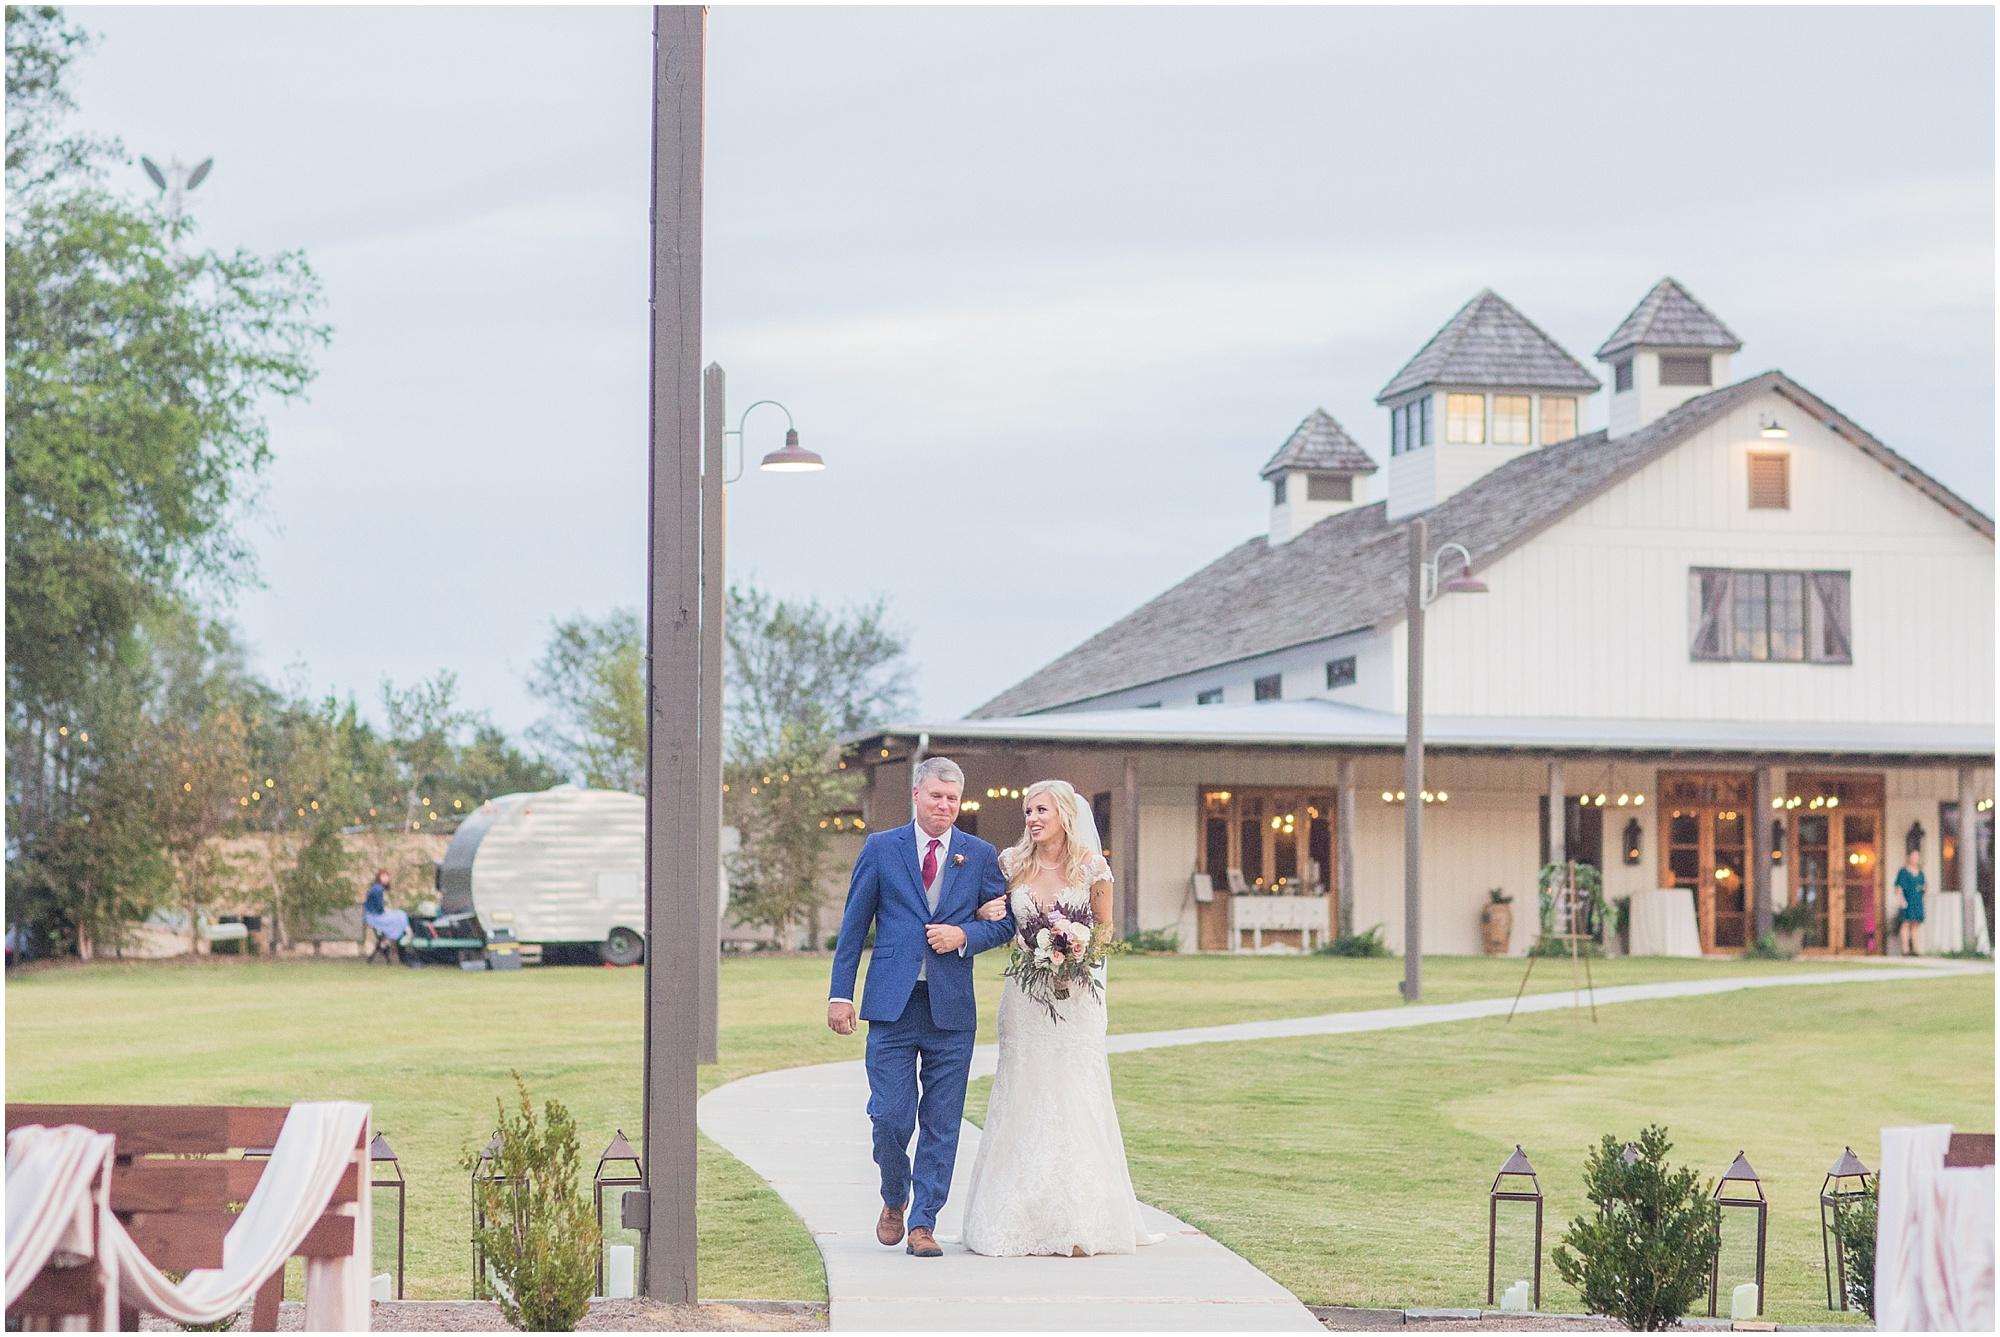 fall-wedding-bridlewood-of-madison-mississippi_0050.jpg